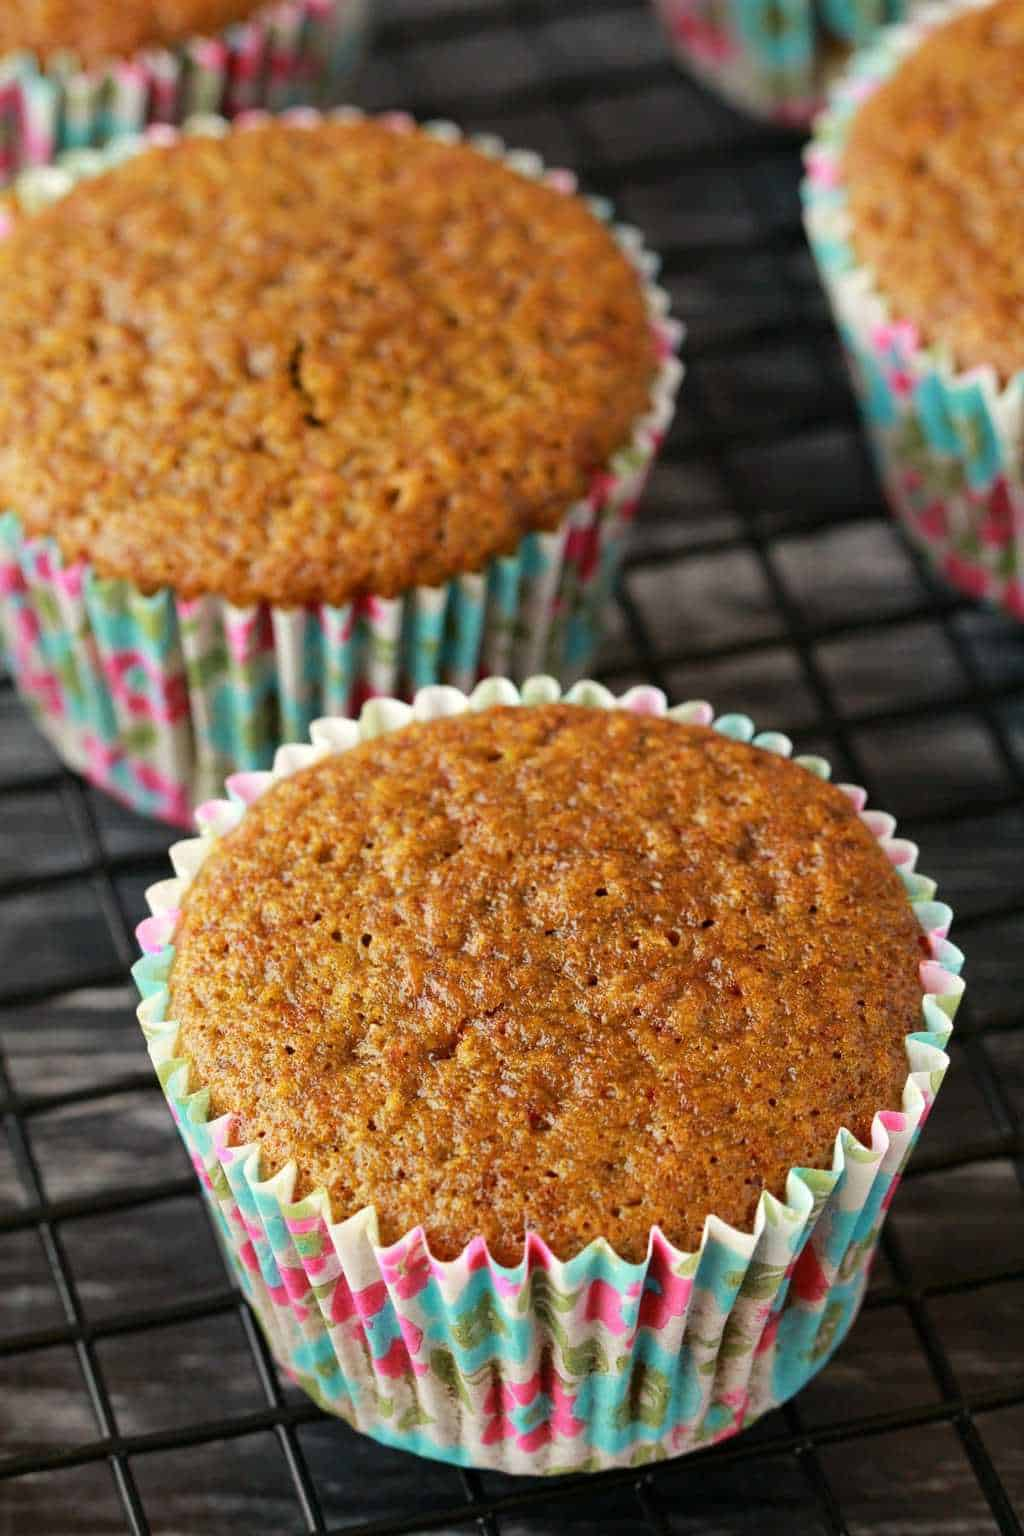 Making Vegan Matcha Green Tea Cupcakes. #vegan #lovingitvegan #dessert #cupcakes